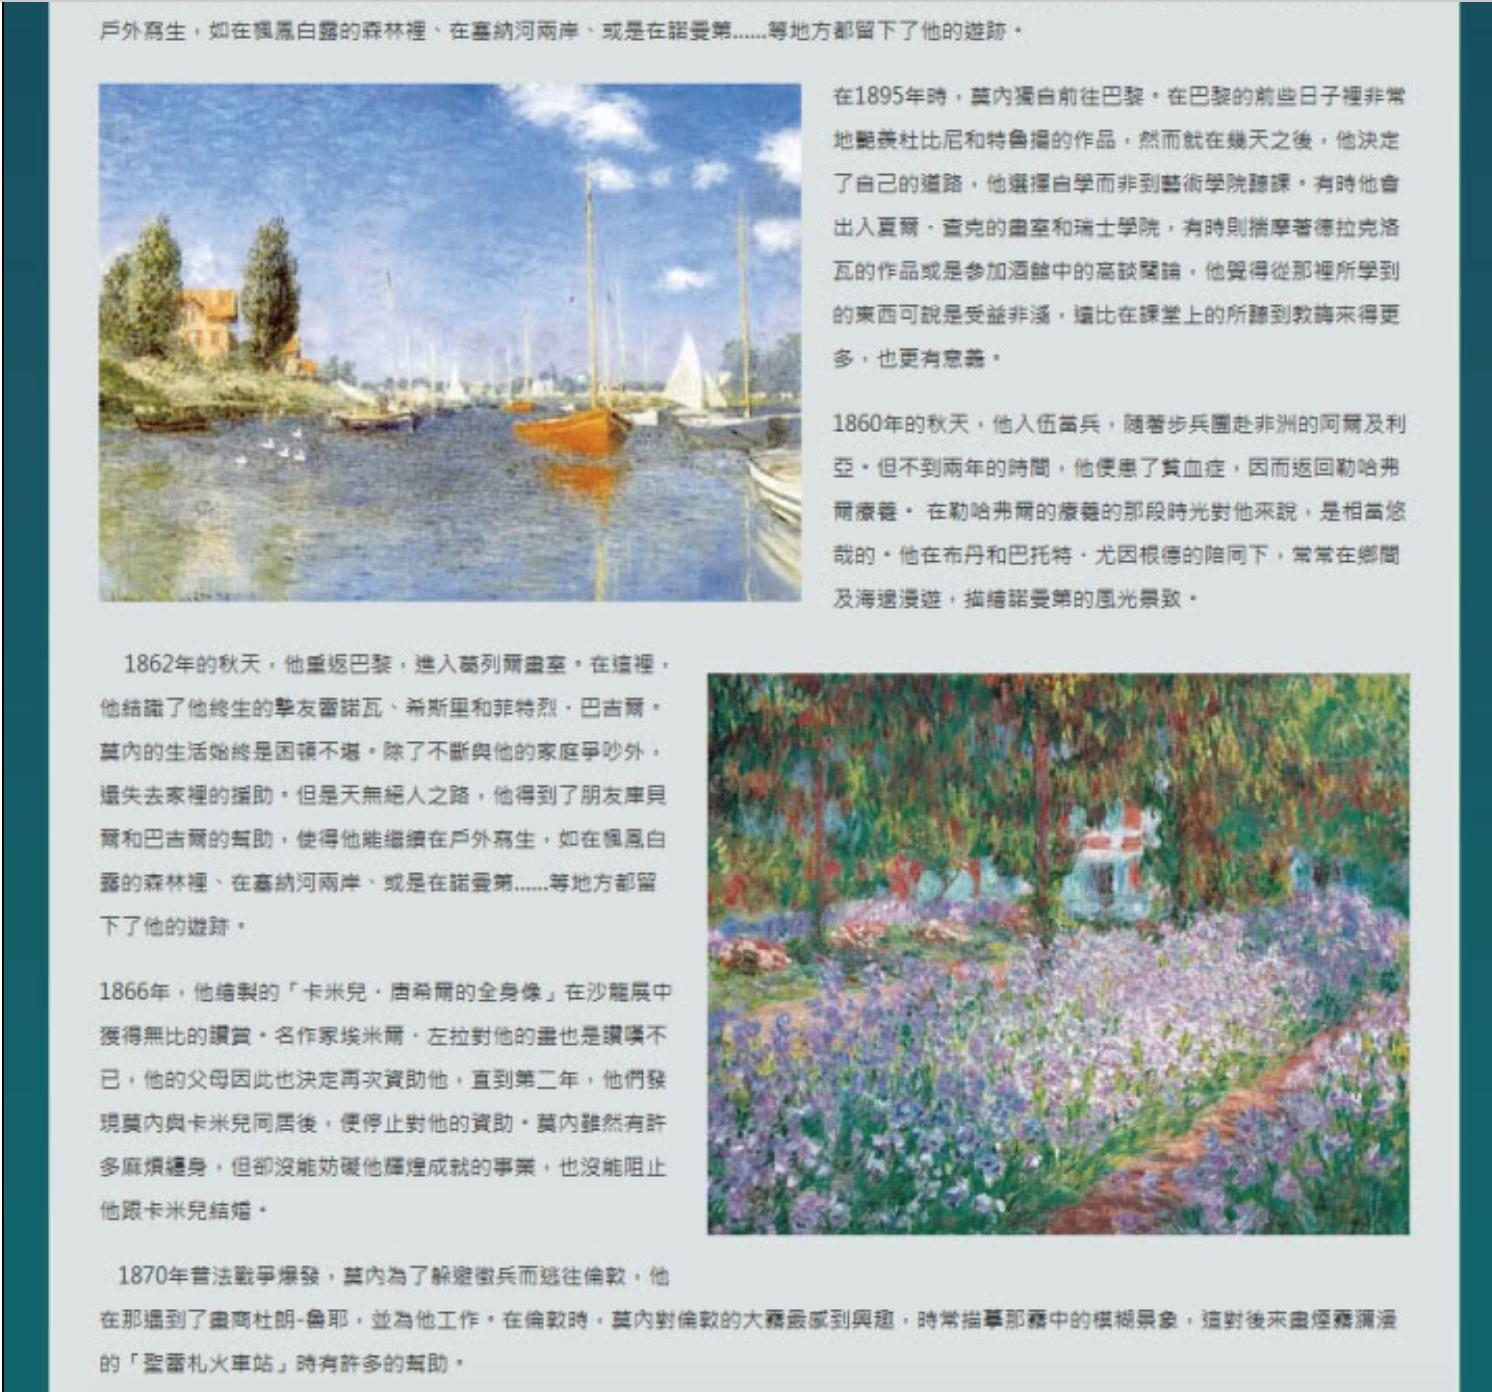 http://mepopedia.com/~jinjin/web/img/502.png